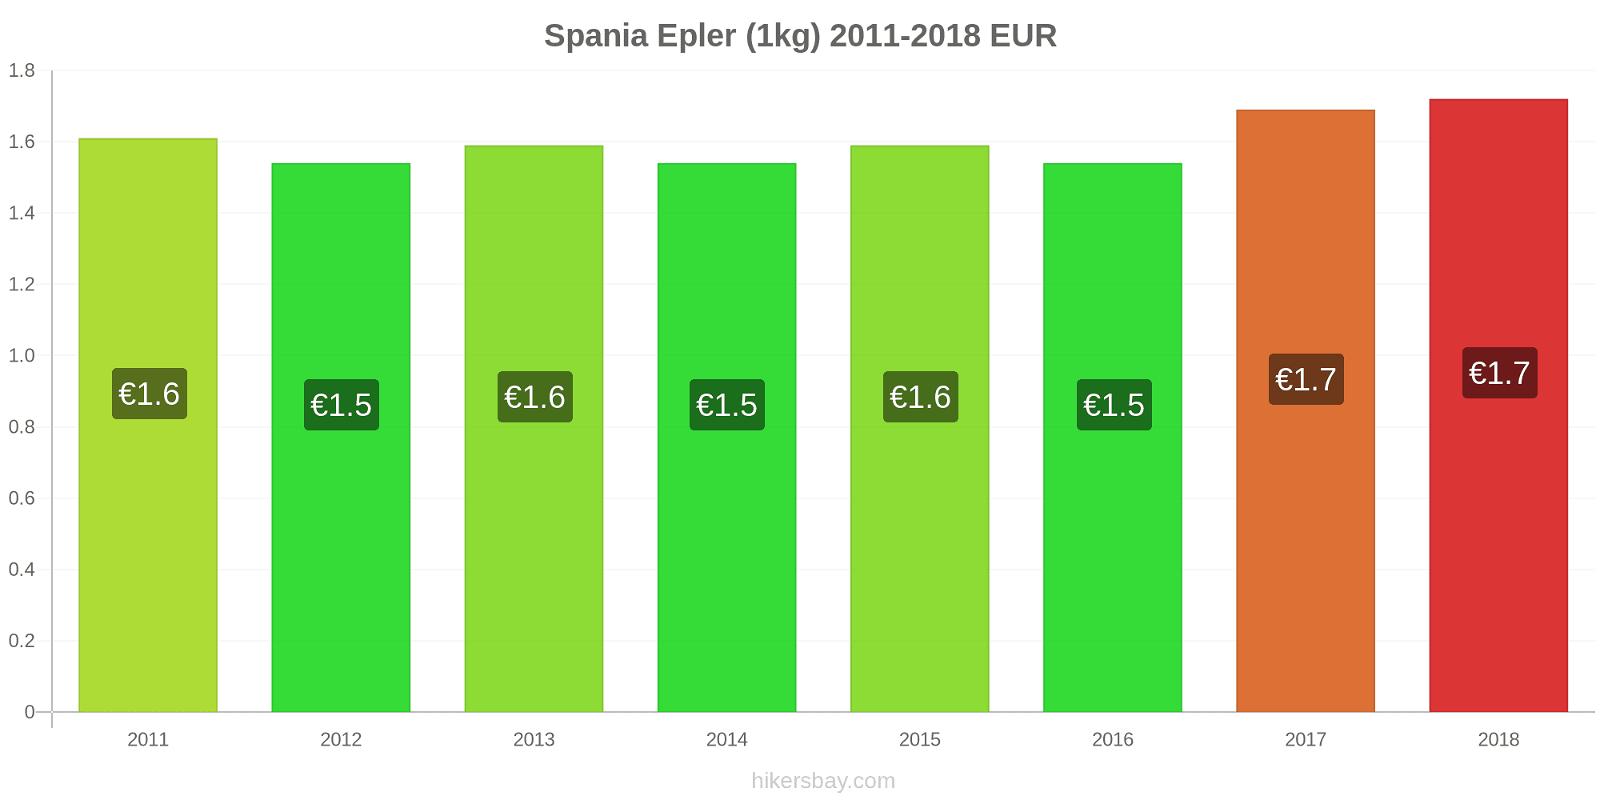 Spania prisendringer Epler (1kg) hikersbay.com